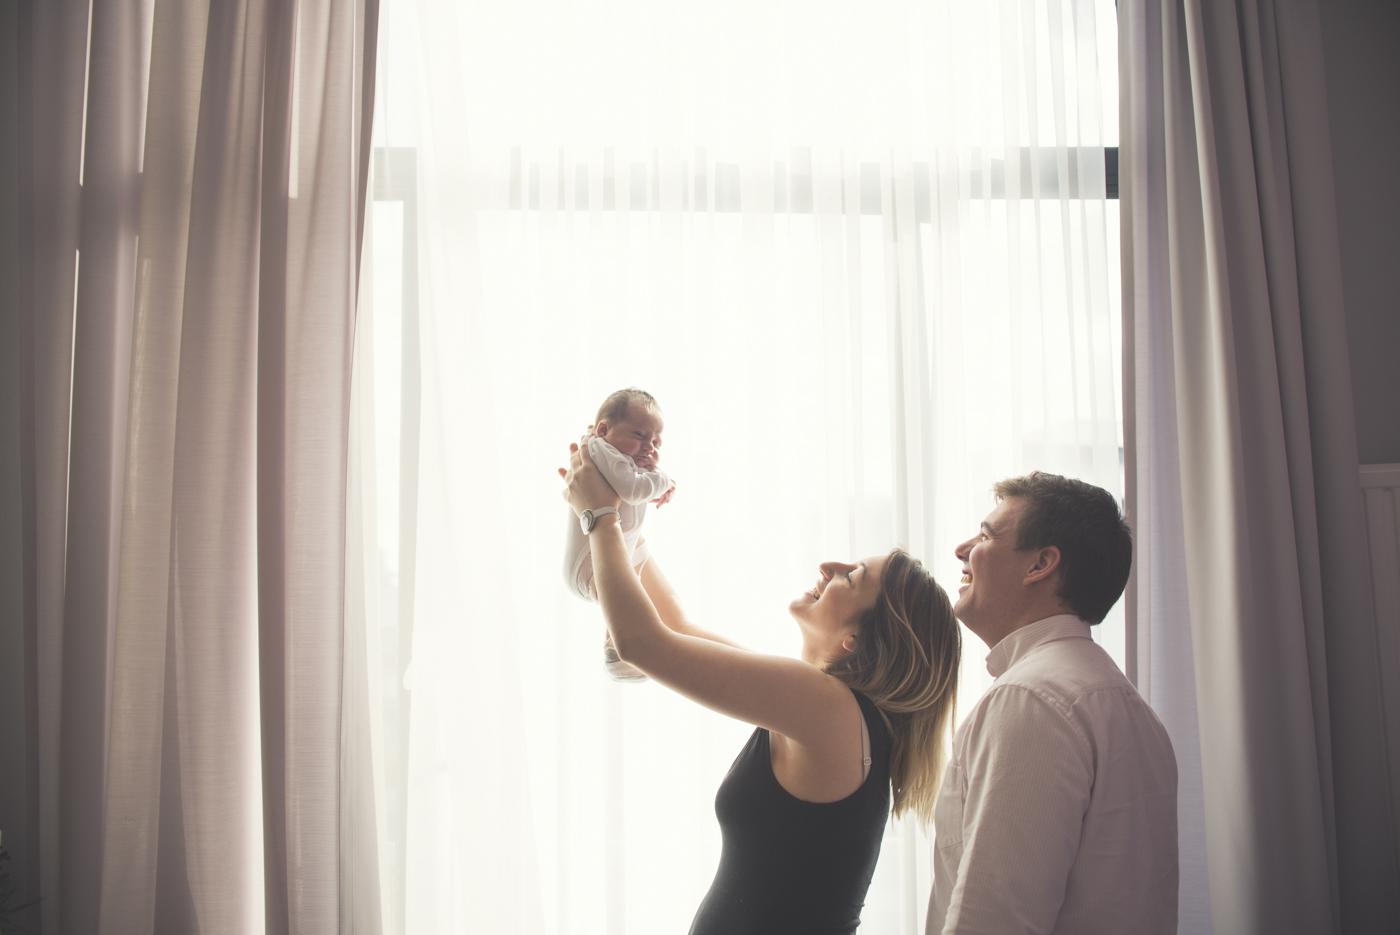 portfolio-fotos-bebes-recien-nacidos-ninos-mia-moments-hospitalbrugman-15.jpg